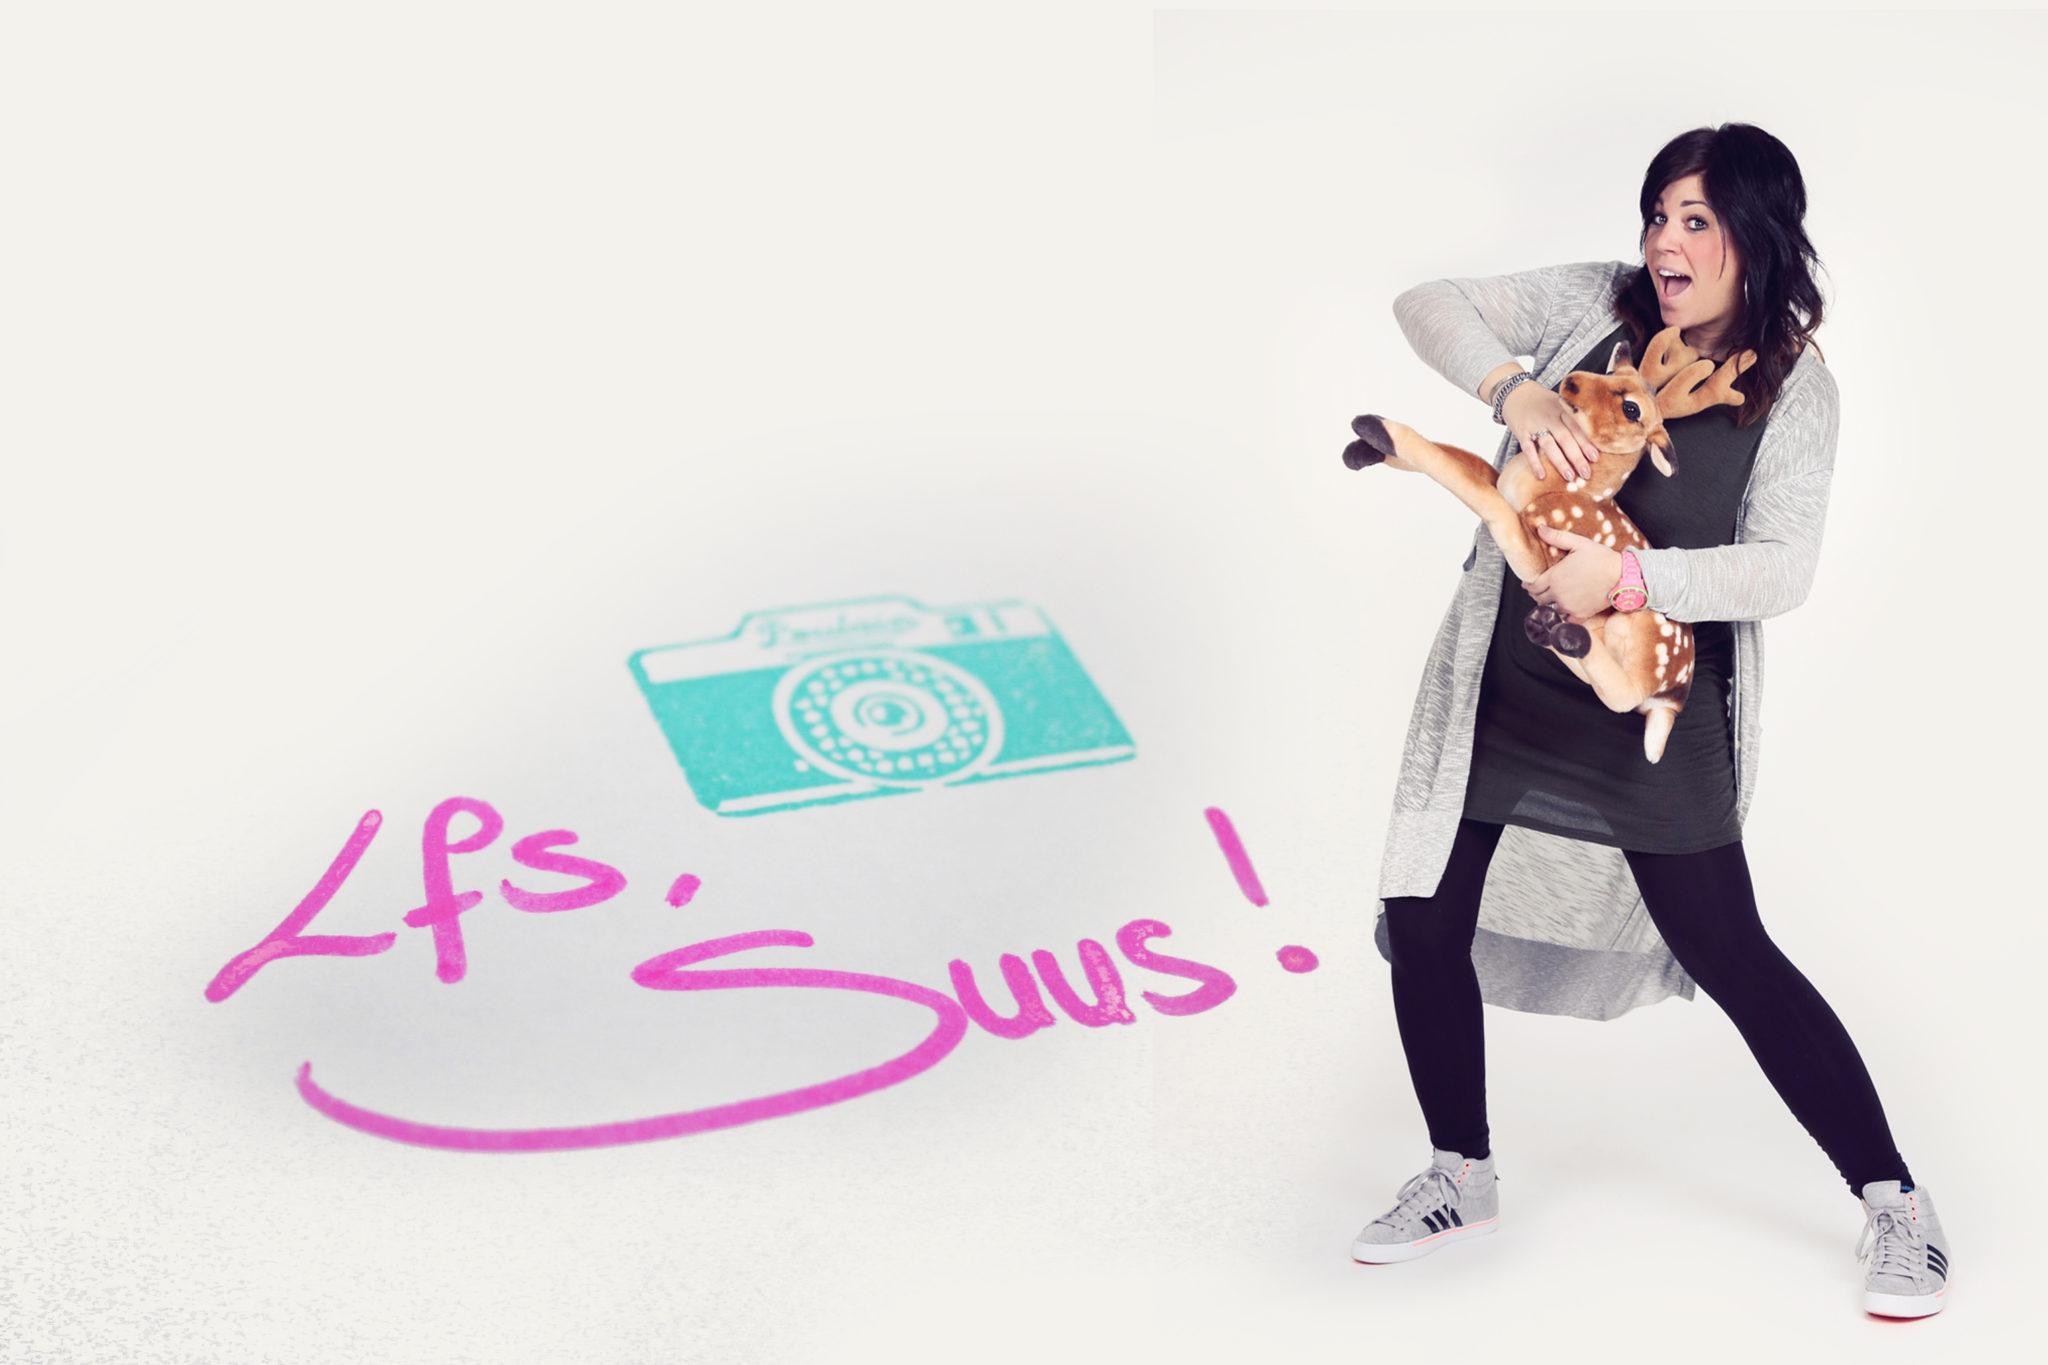 Suzan Reuvers - Suus in de Media - Oldenzaal - Liefs